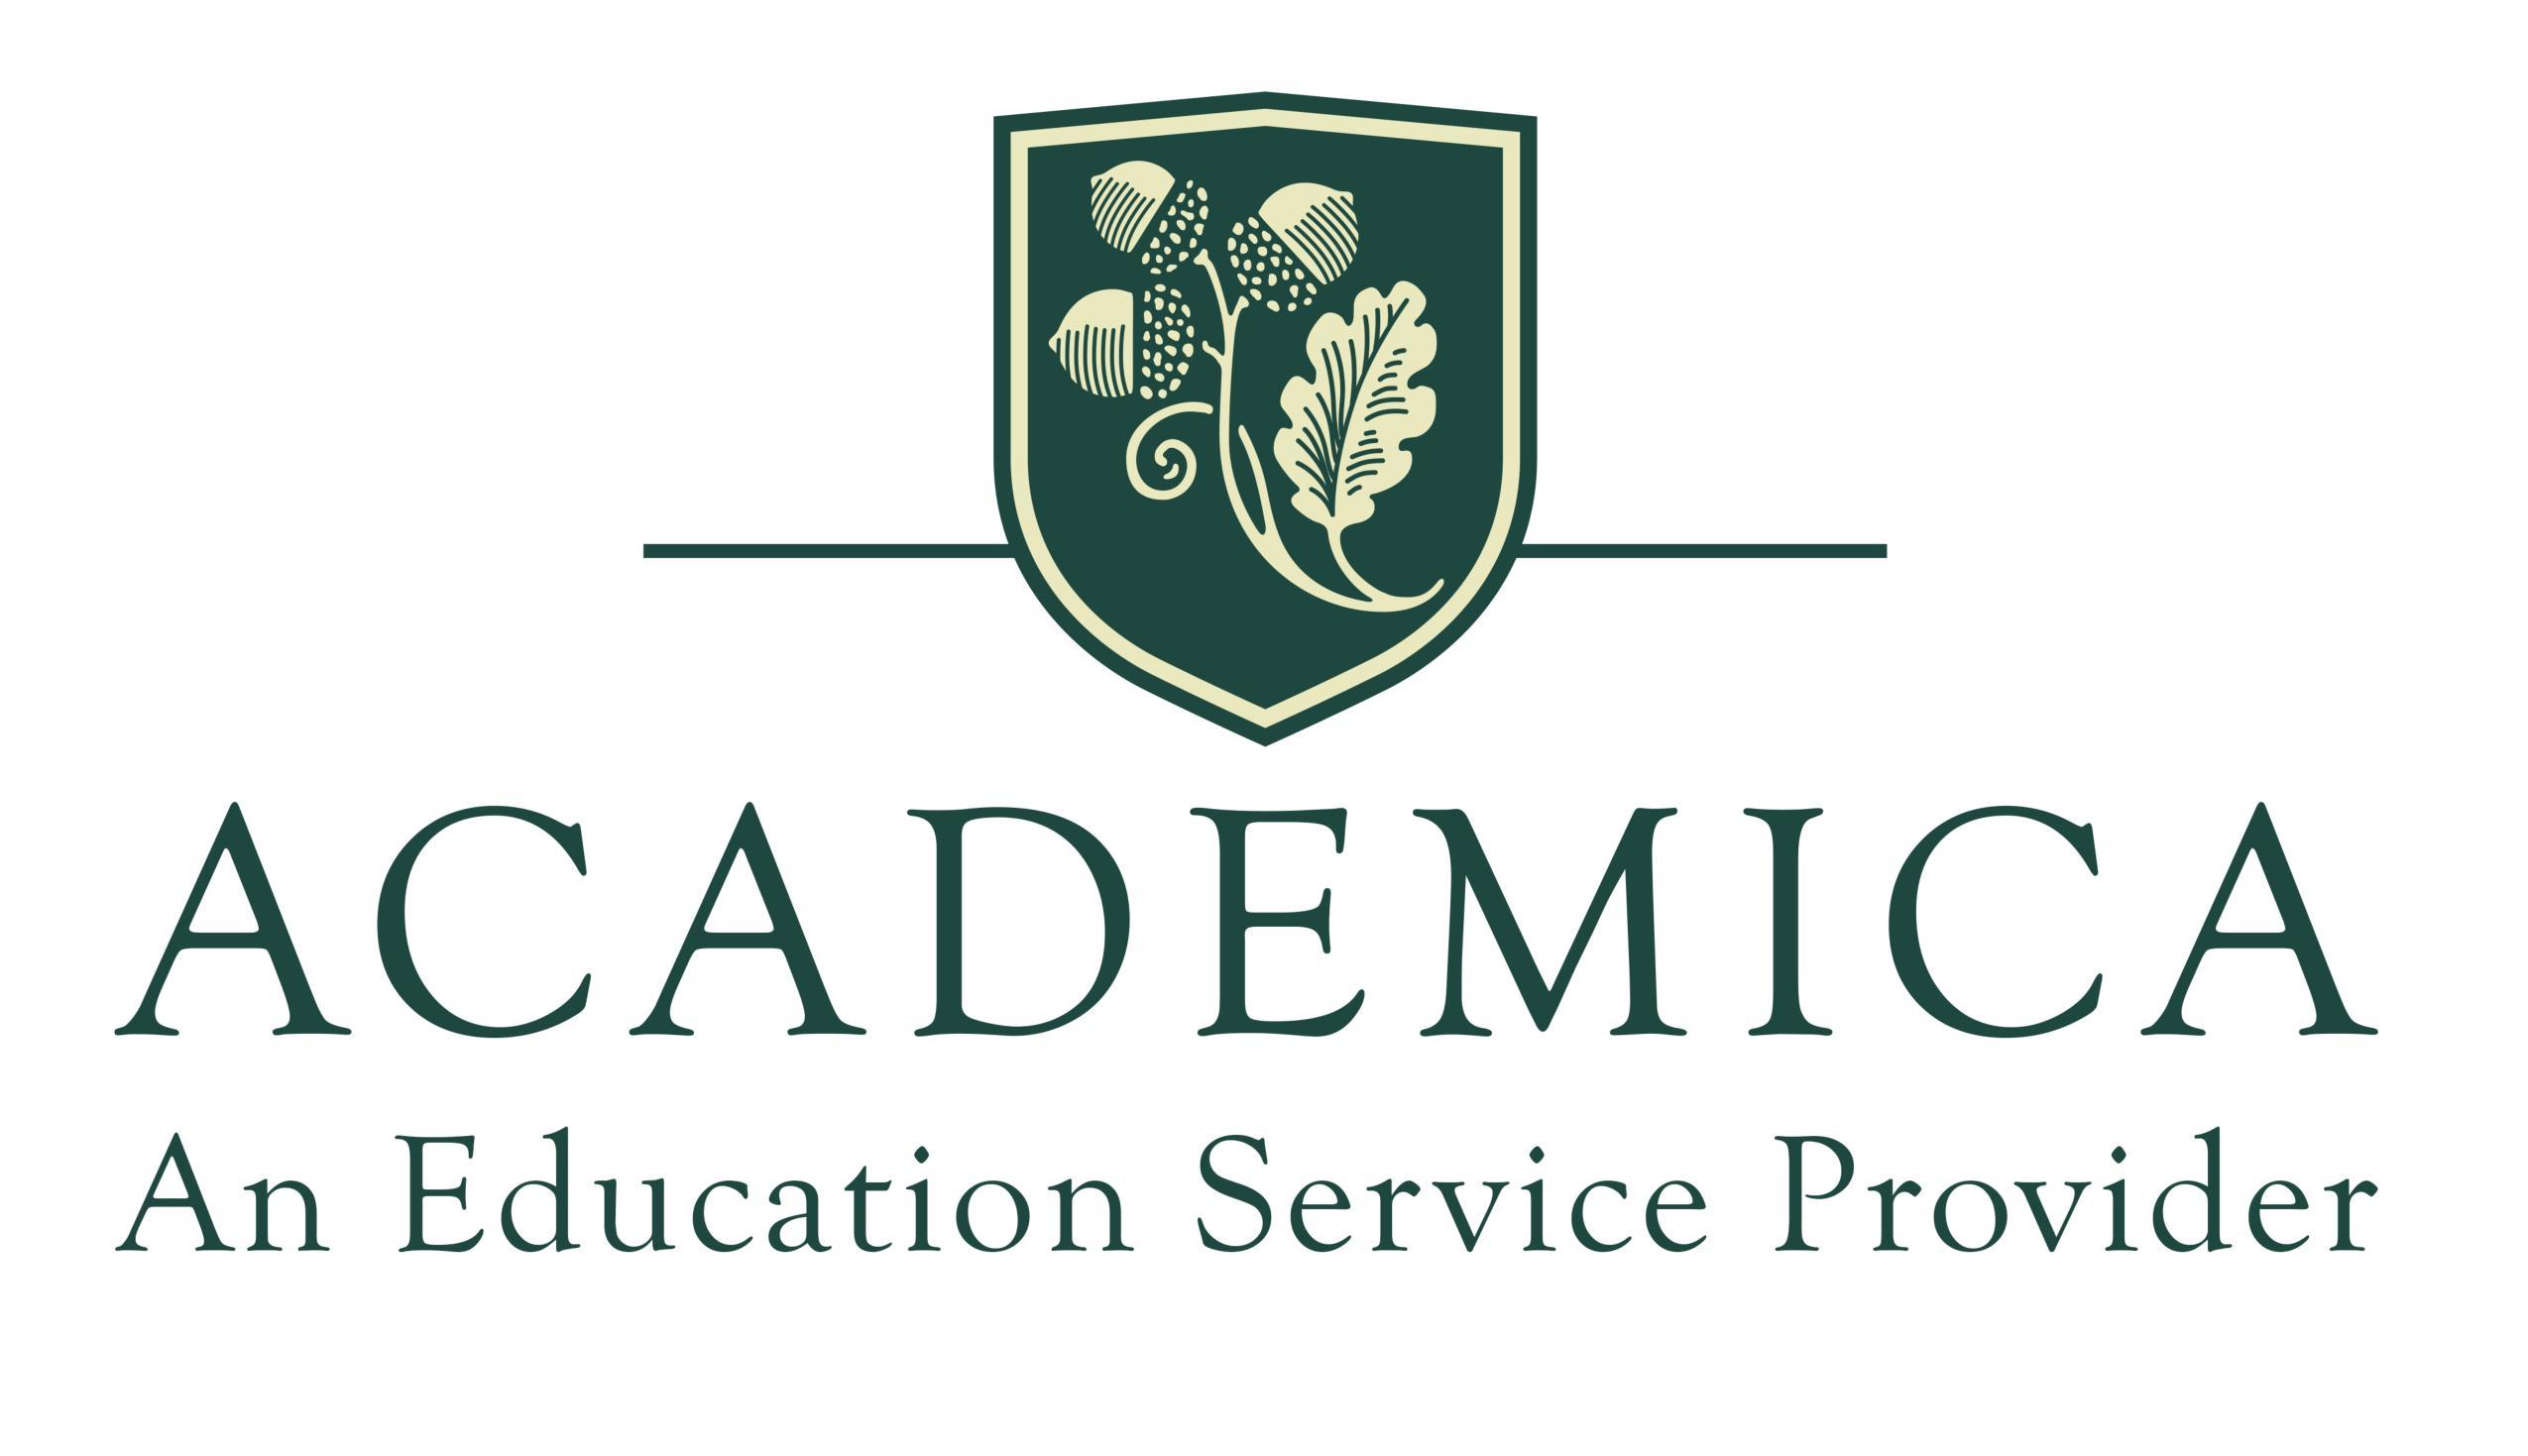 Academica company logo